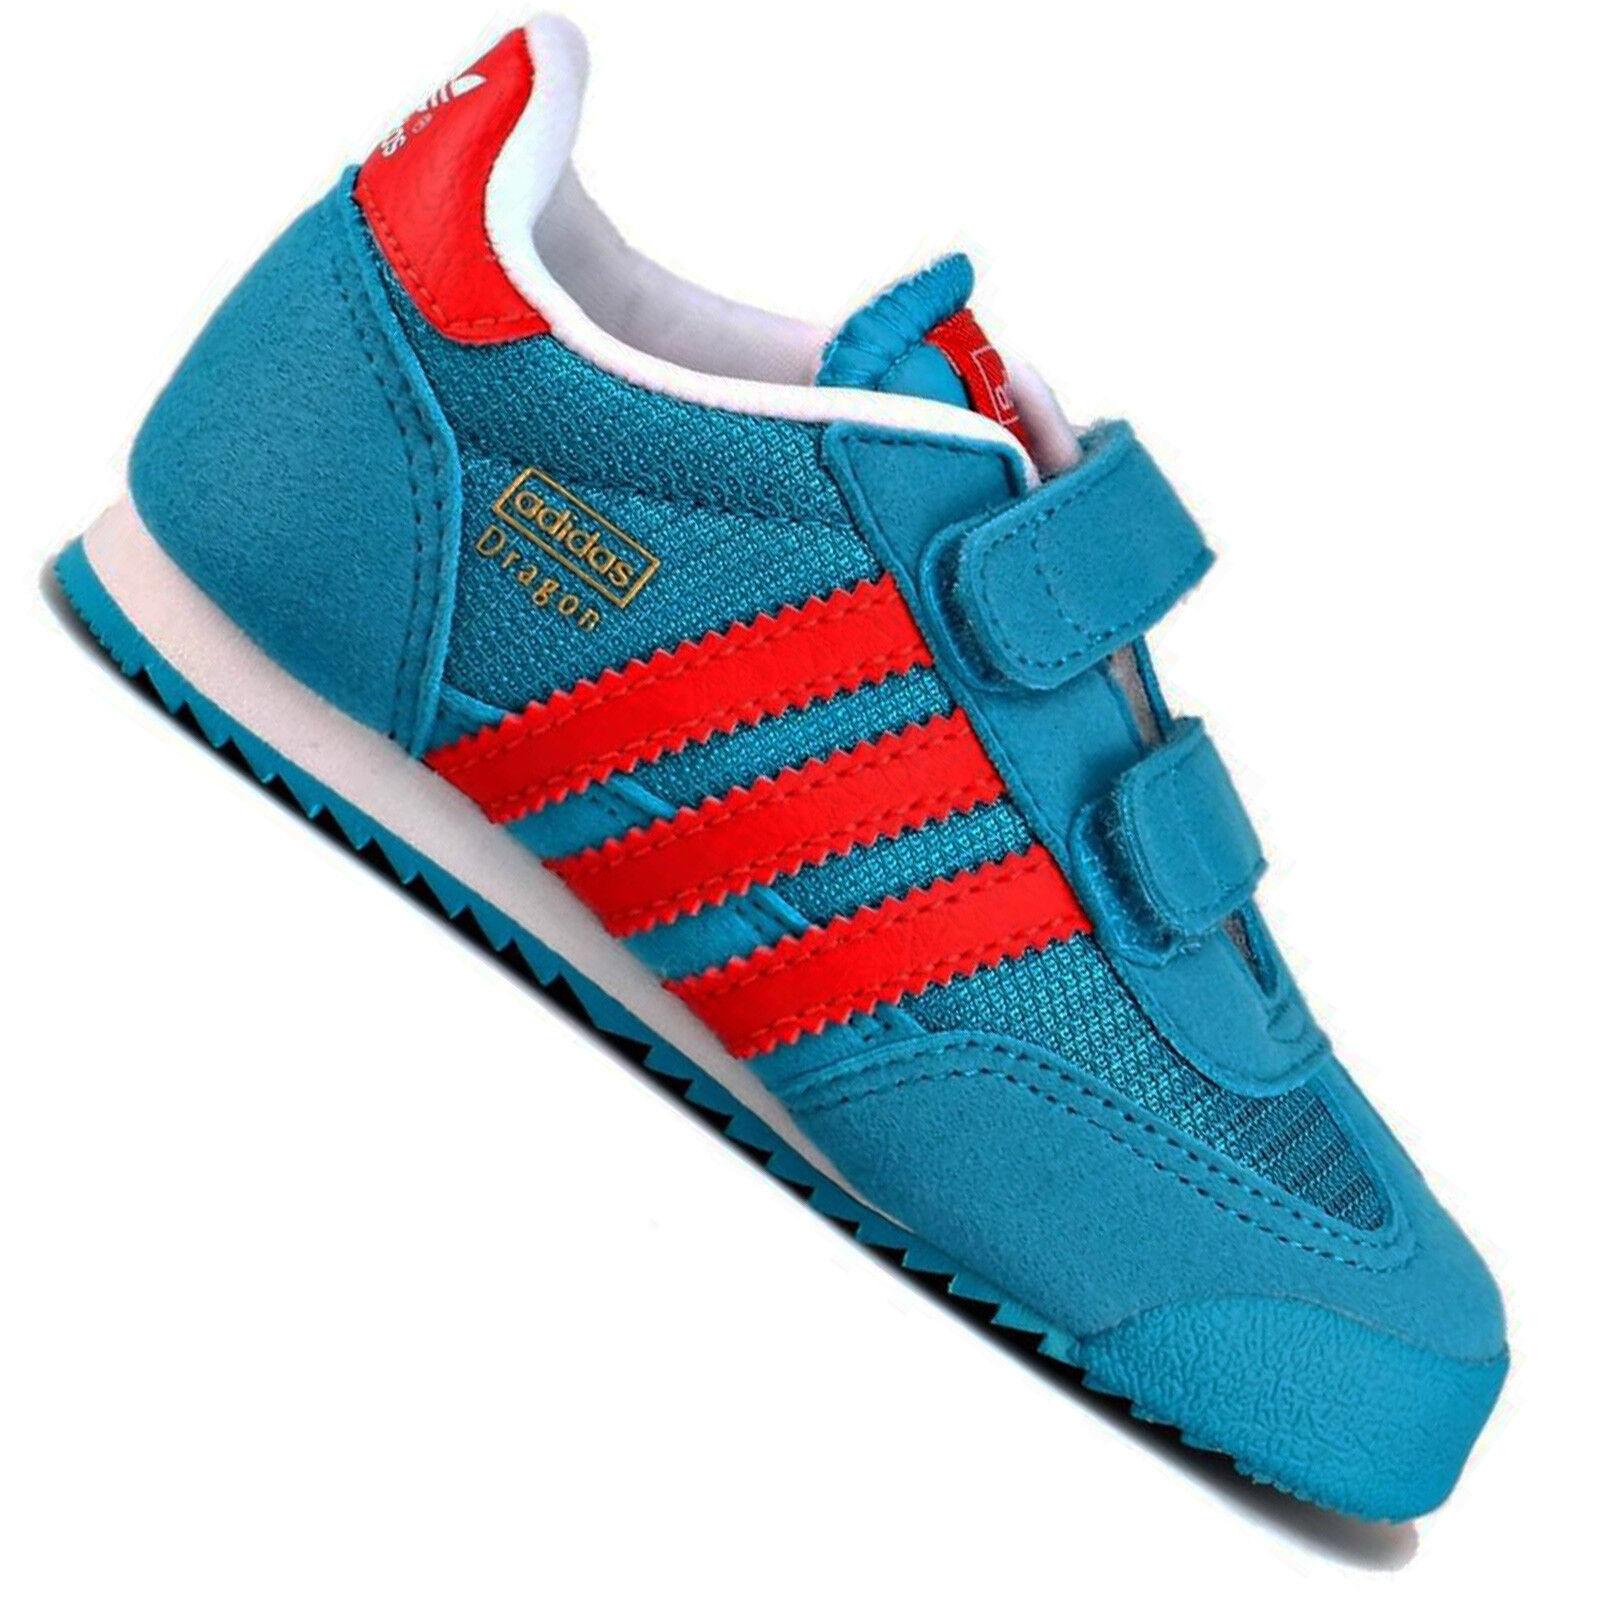 adidas Originals Dragon Baby Kinder Lauflernschuhe Sneaker Aqua Blau Rot 19